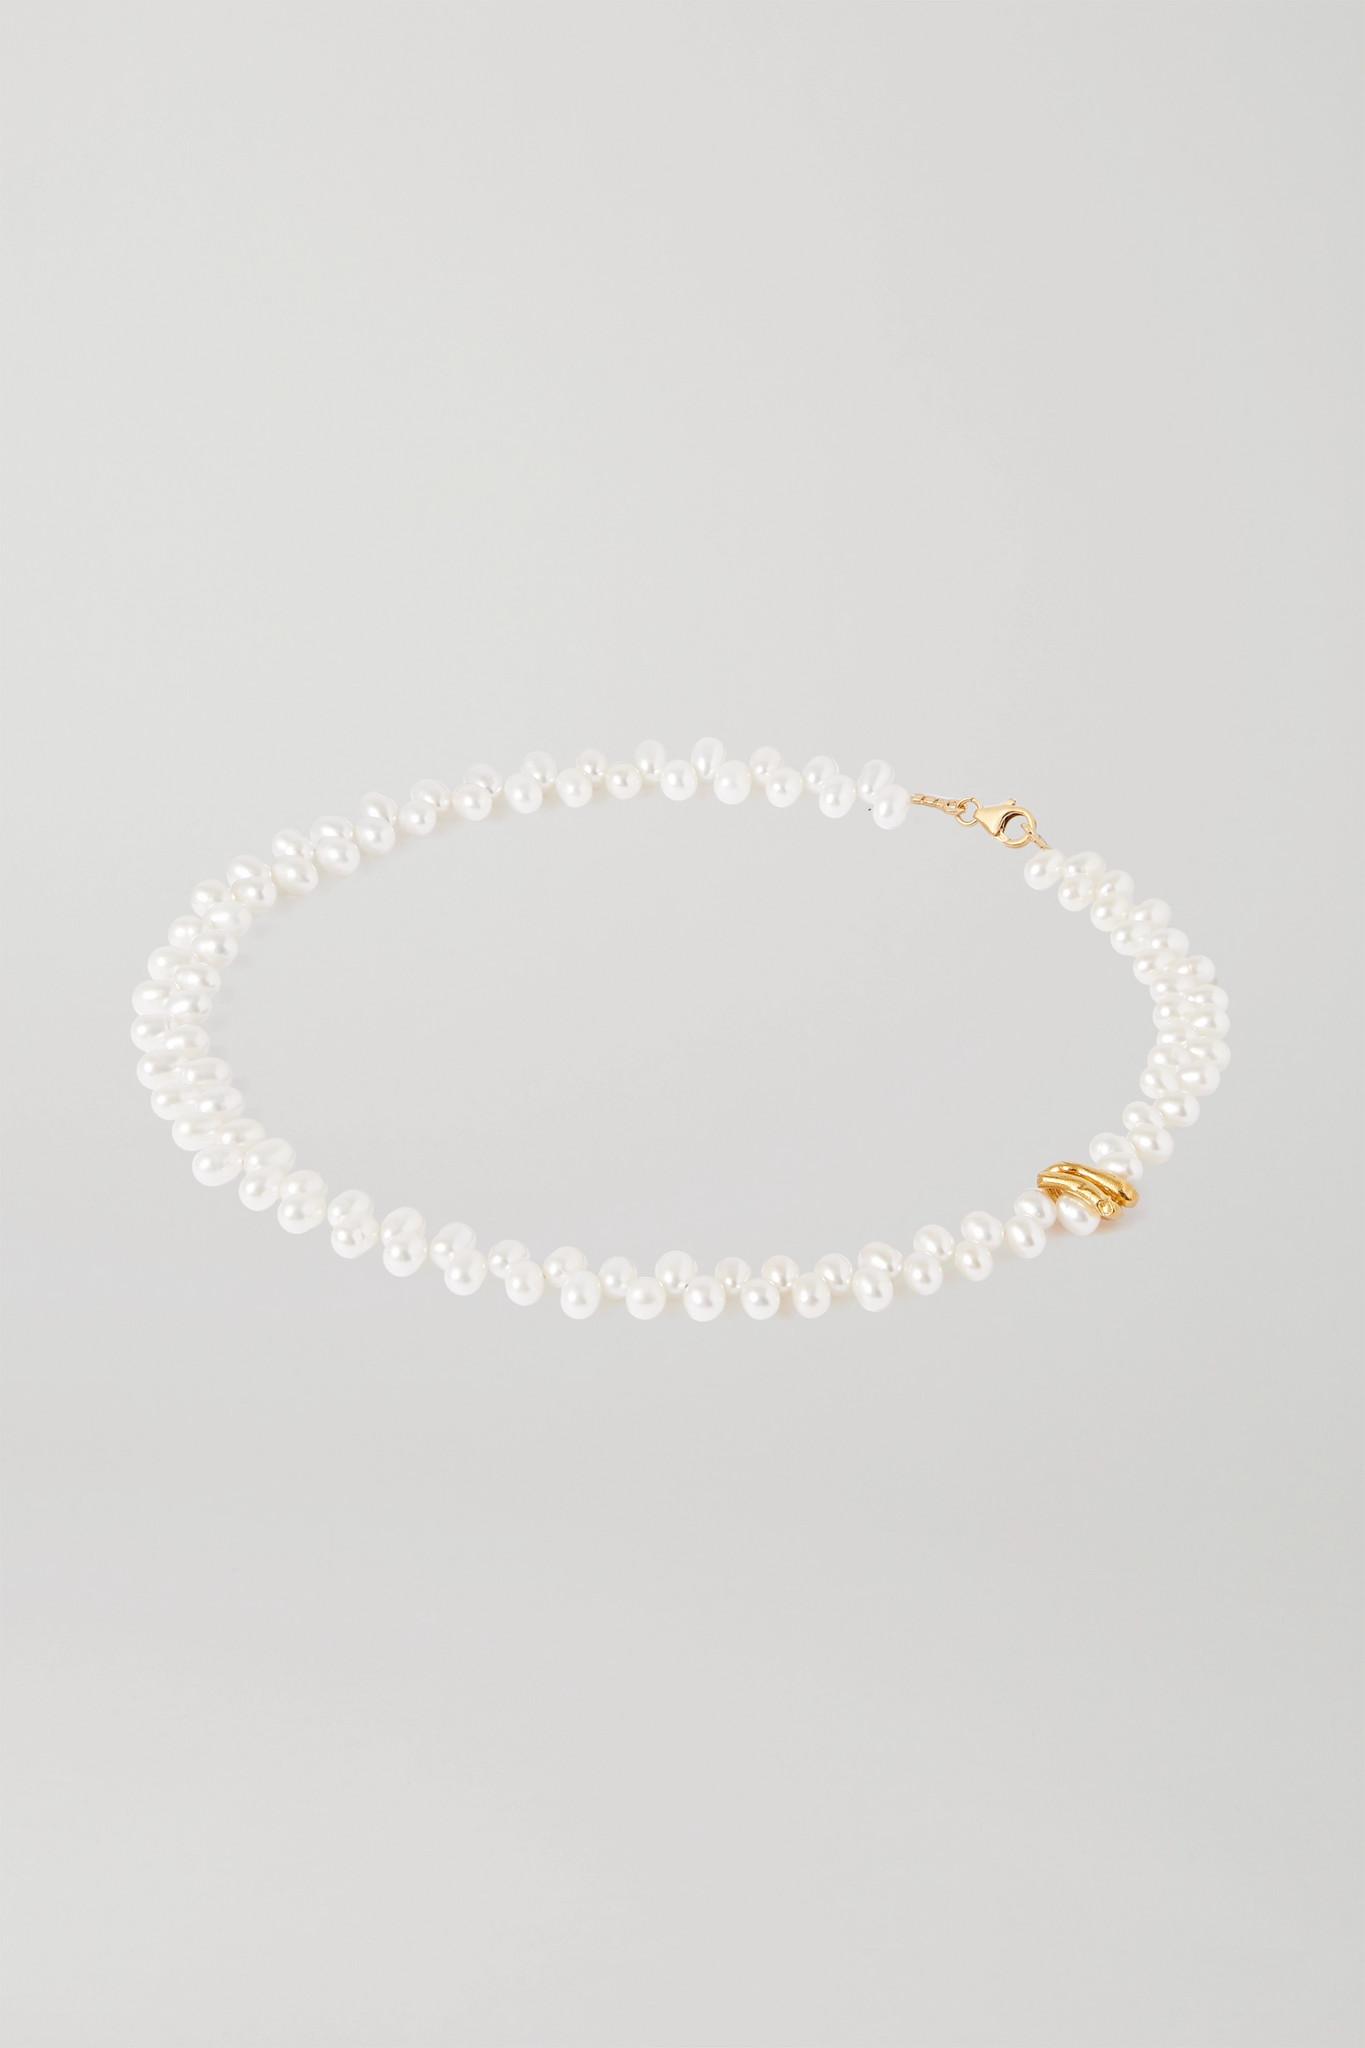 Inauguration Fashion 2021: Alighieri gold plated pearl neckace, $310